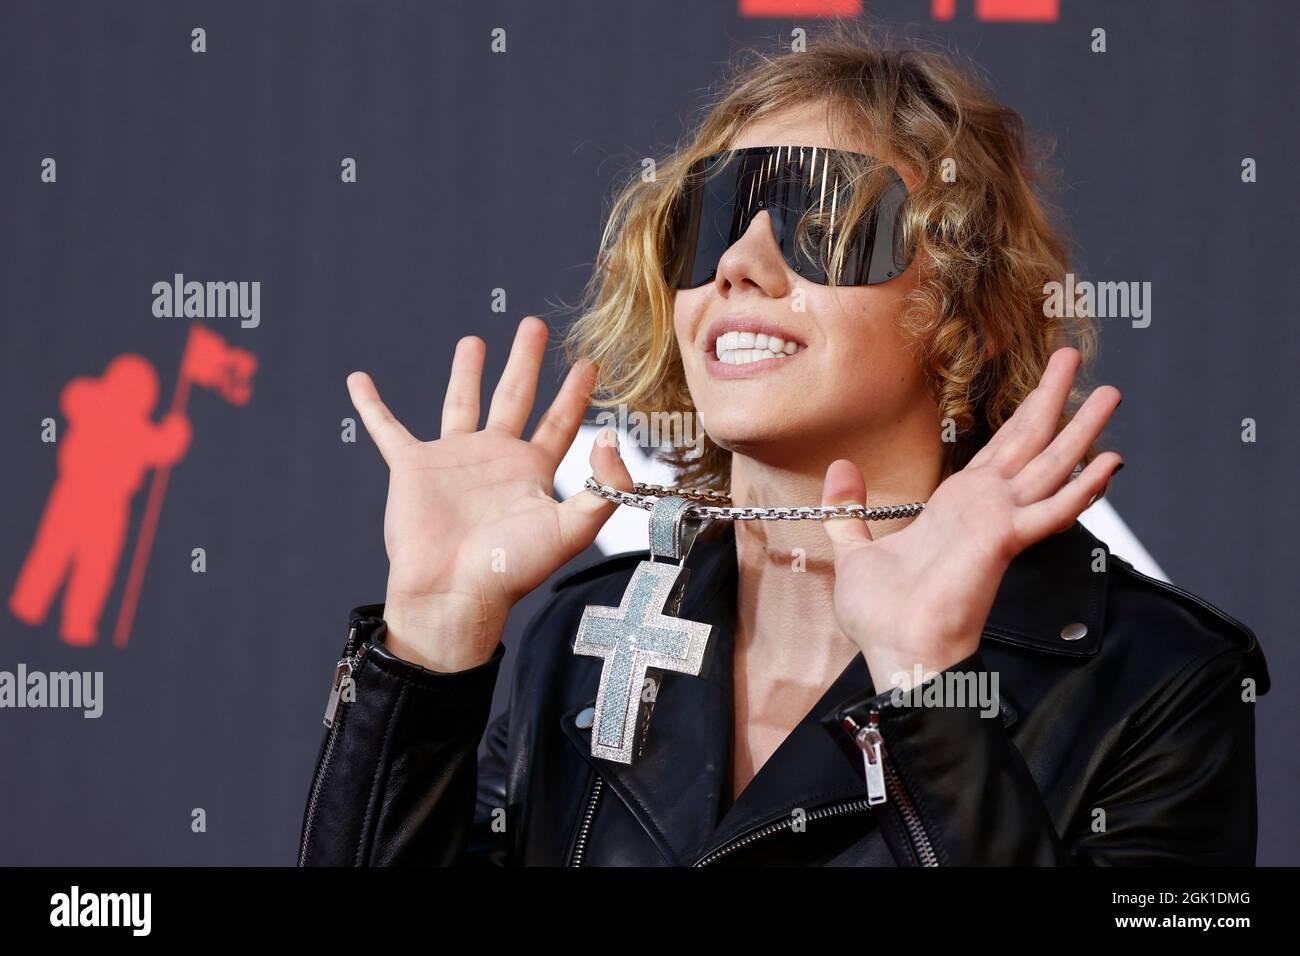 2021 MTV Video Music Awards - Ankunft - Barclays Center, Brooklyn, New York, USA, 12. September, 2021 - The Kid Laroi. REUTERS/Andrew Kelly Stockfoto